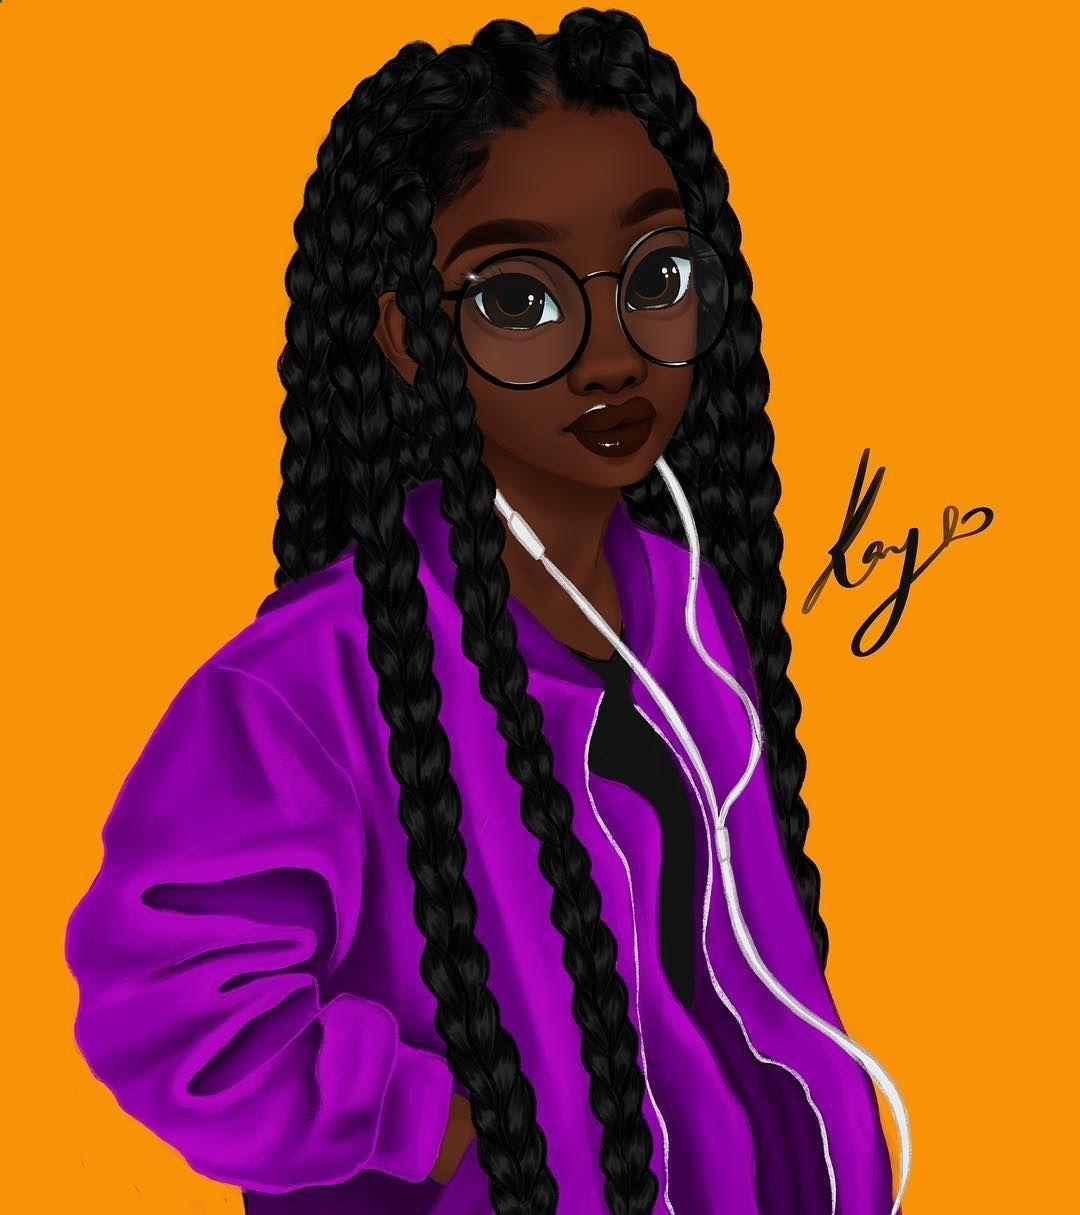 Pin By Charissa Walker On More Ideas Art Black Girl Art Drawings Of Black Girls Black Girl Magic Art